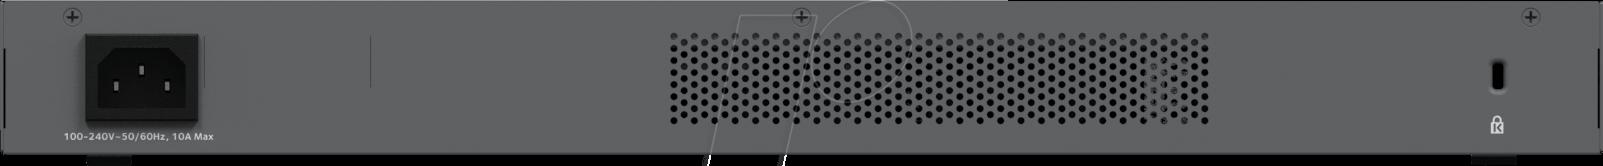 NETGEAR GC752XP - 52-port Gigabit Ethernet switch, PoE